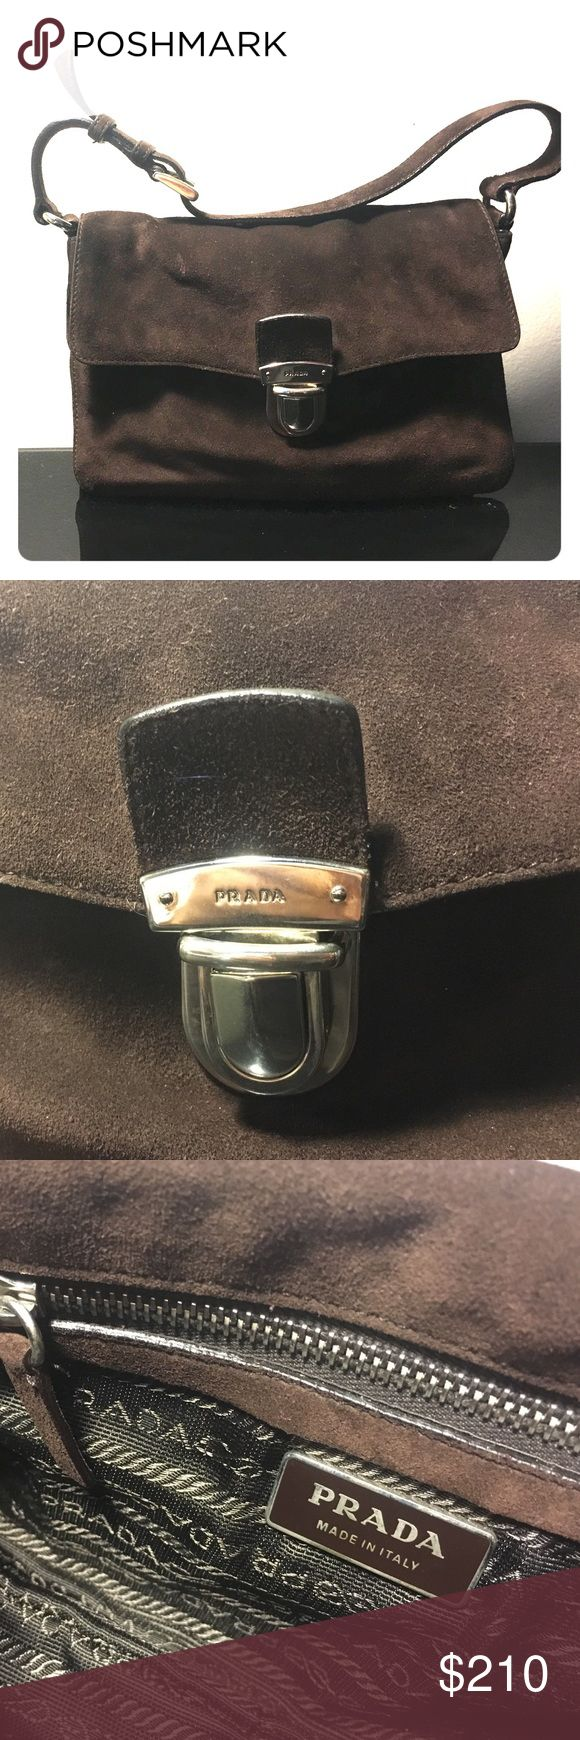 Selling this Prada suede handbag on Poshmark! My username is: edelai. #shopmycloset #poshmark #fashion #shopping #style #forsale #Handbags